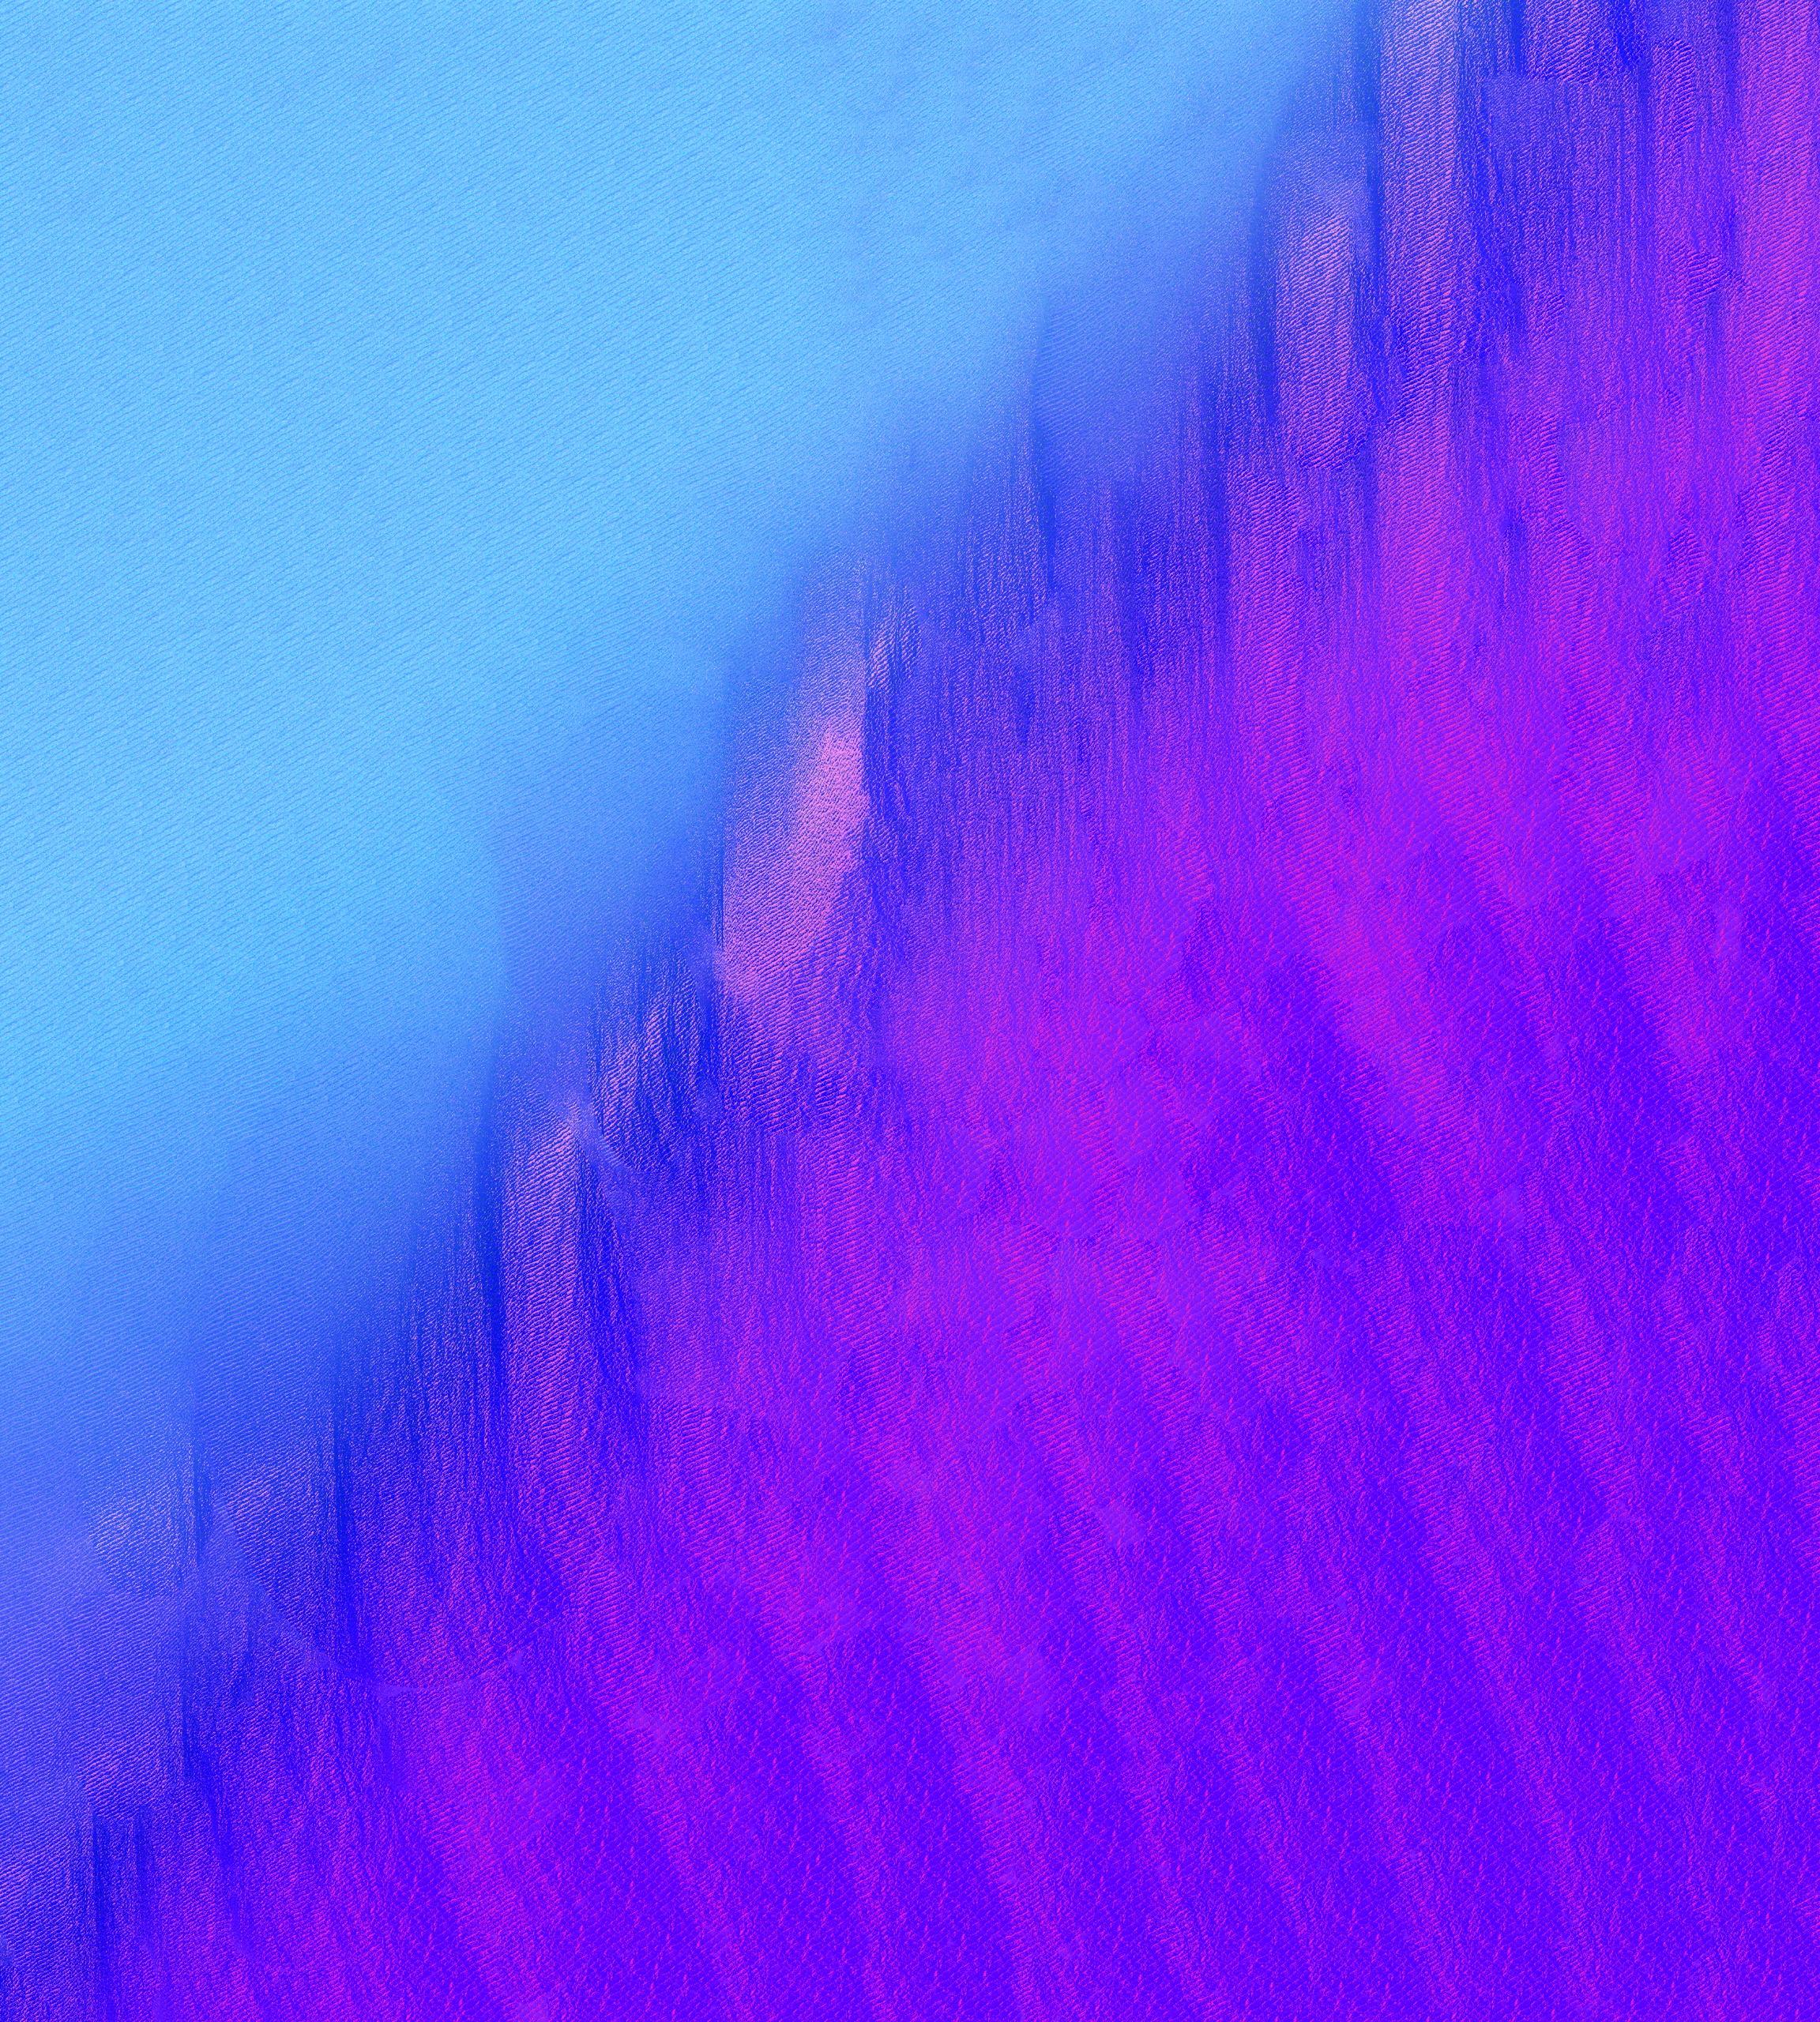 <img eyes blue sky decomposi - himalayev | ello